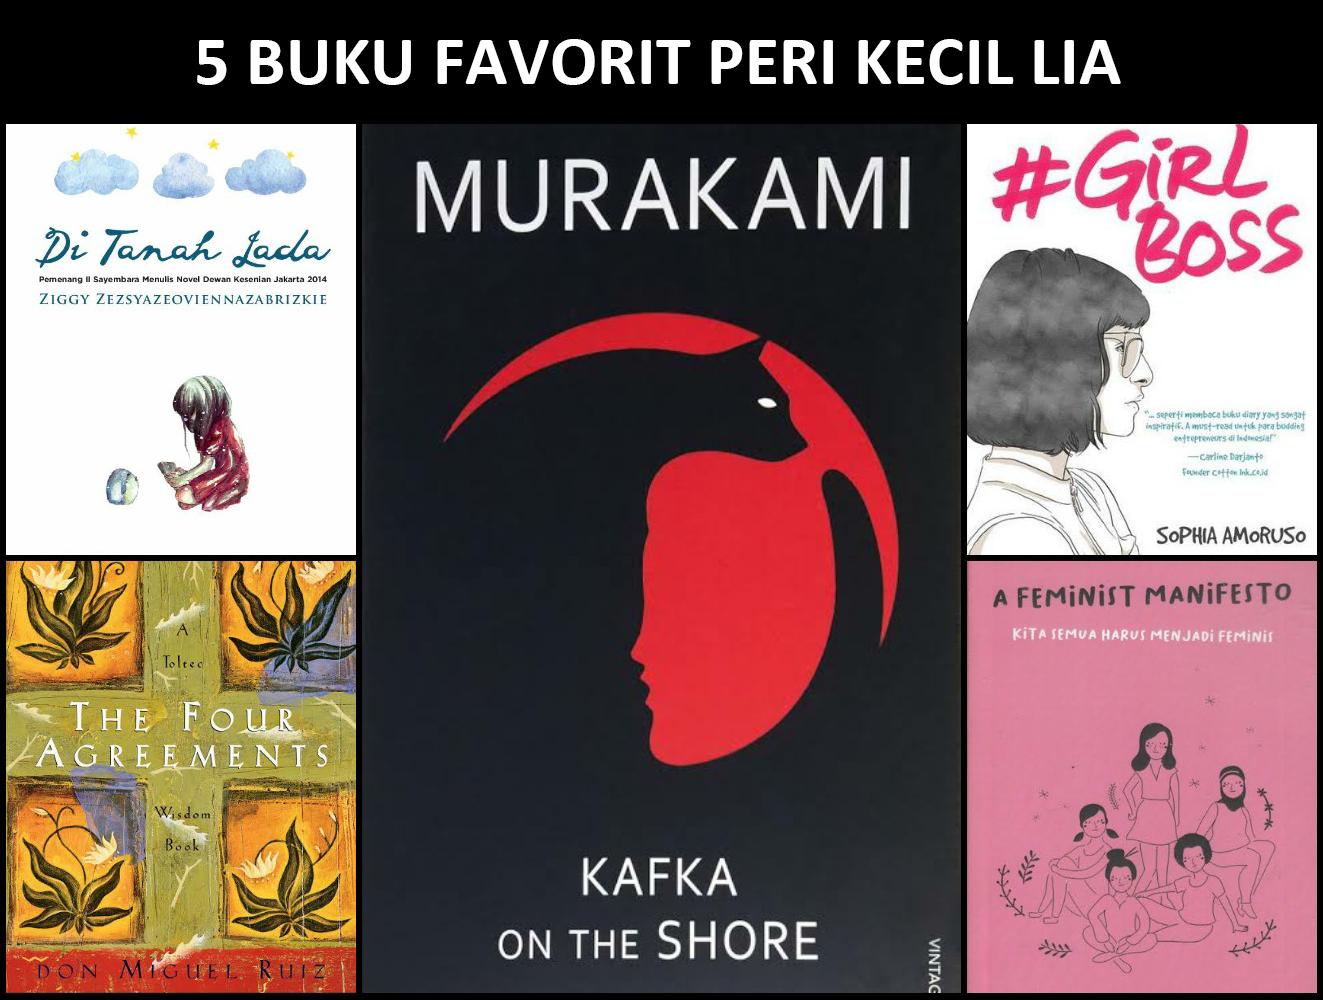 Sampul Buku Menarik dan Buku yang Sering Dibaca Ulang (Bersama Peri Kecil Lia)